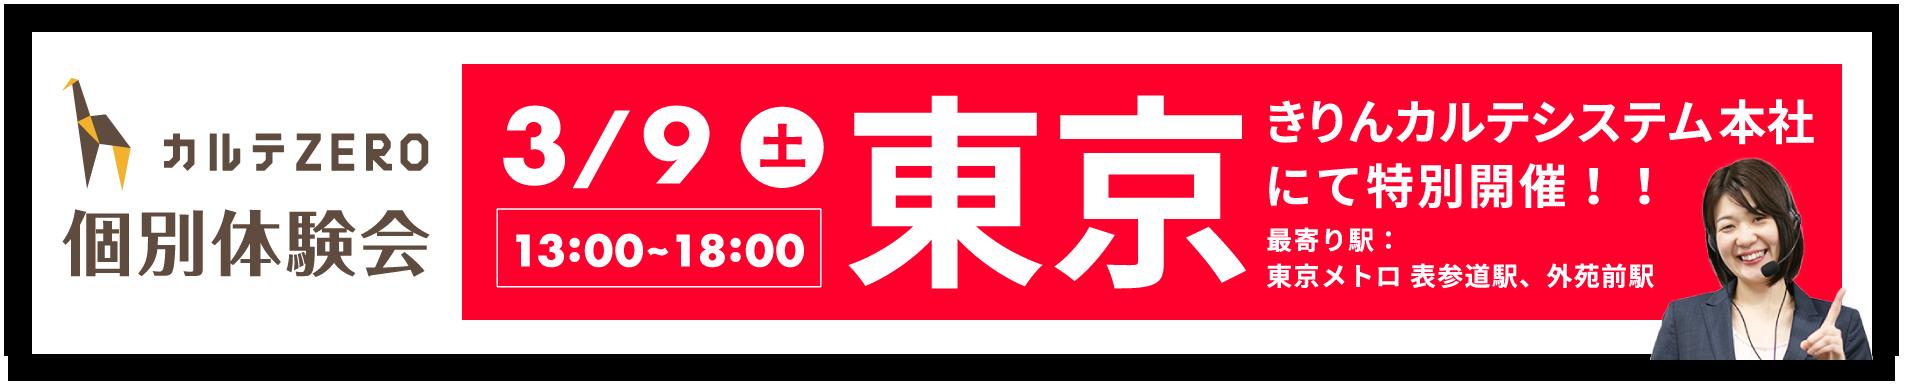 『カルテZERO』個別体験会 in東京 土曜開催!